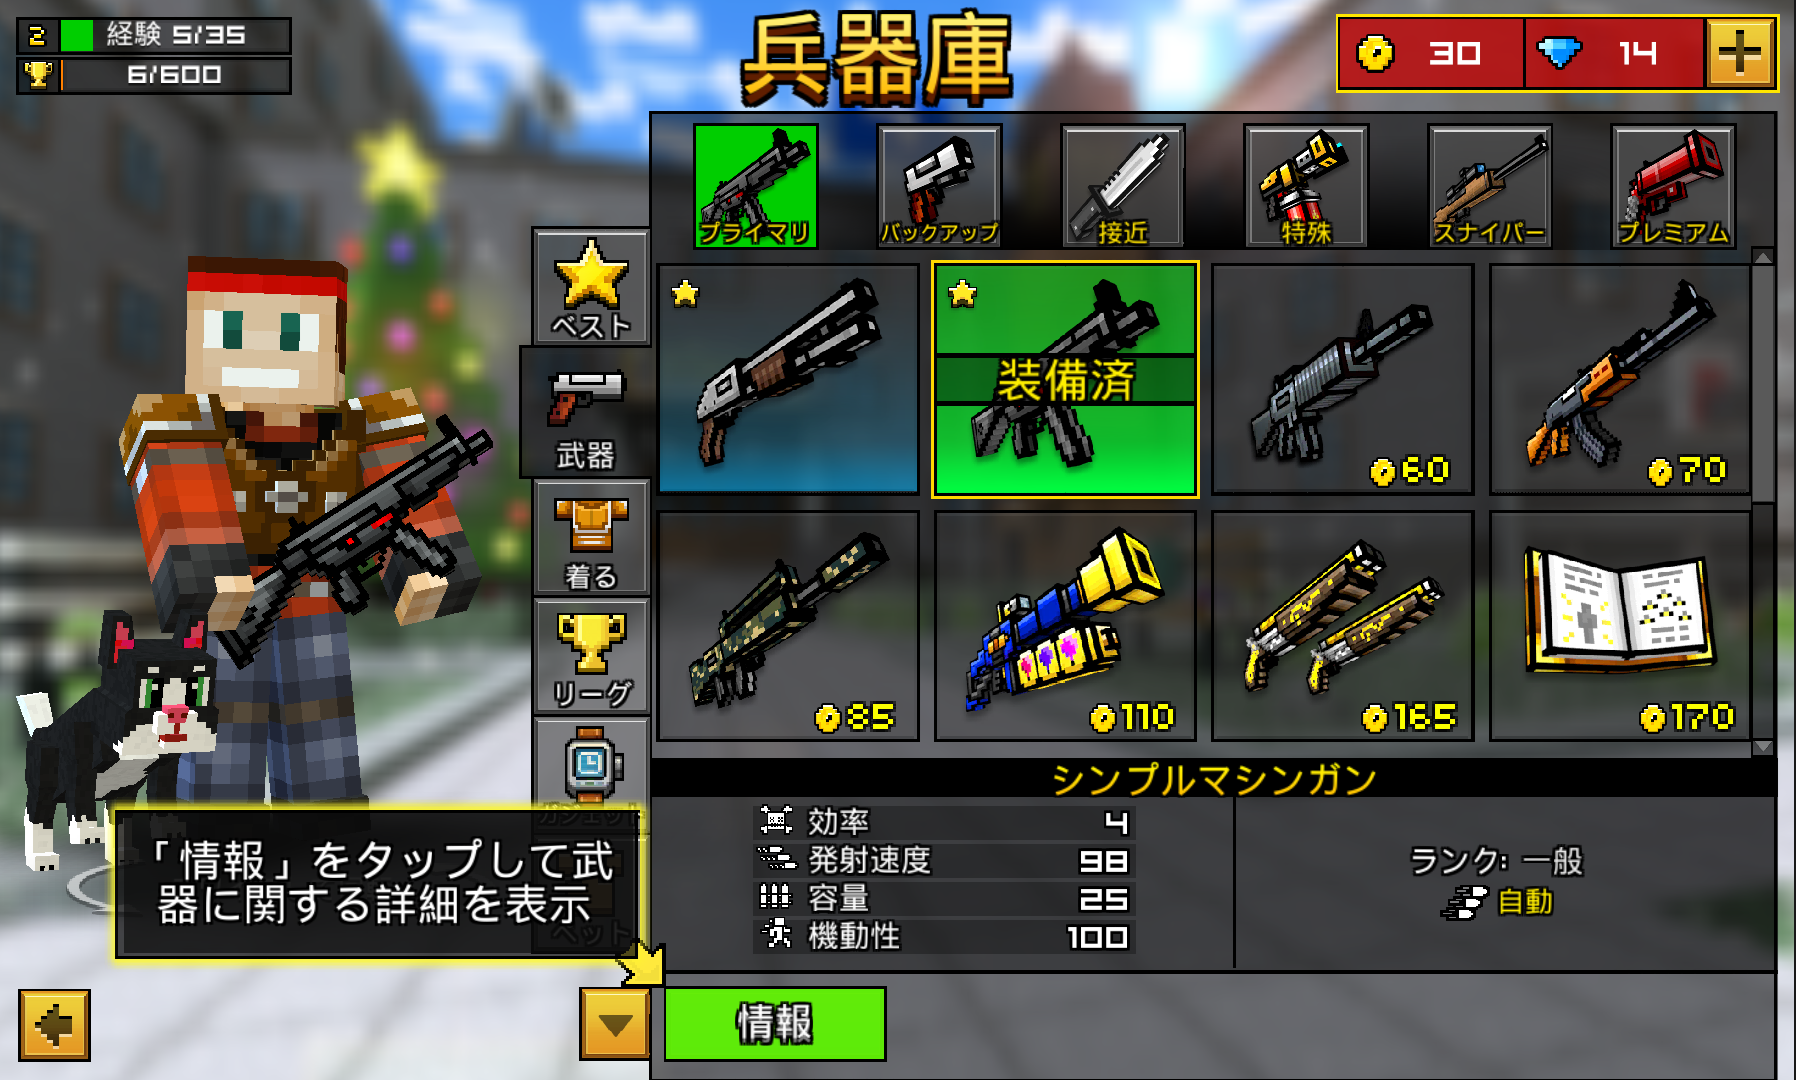 androidアプリ Pixel Gun 3D攻略スクリーンショット2